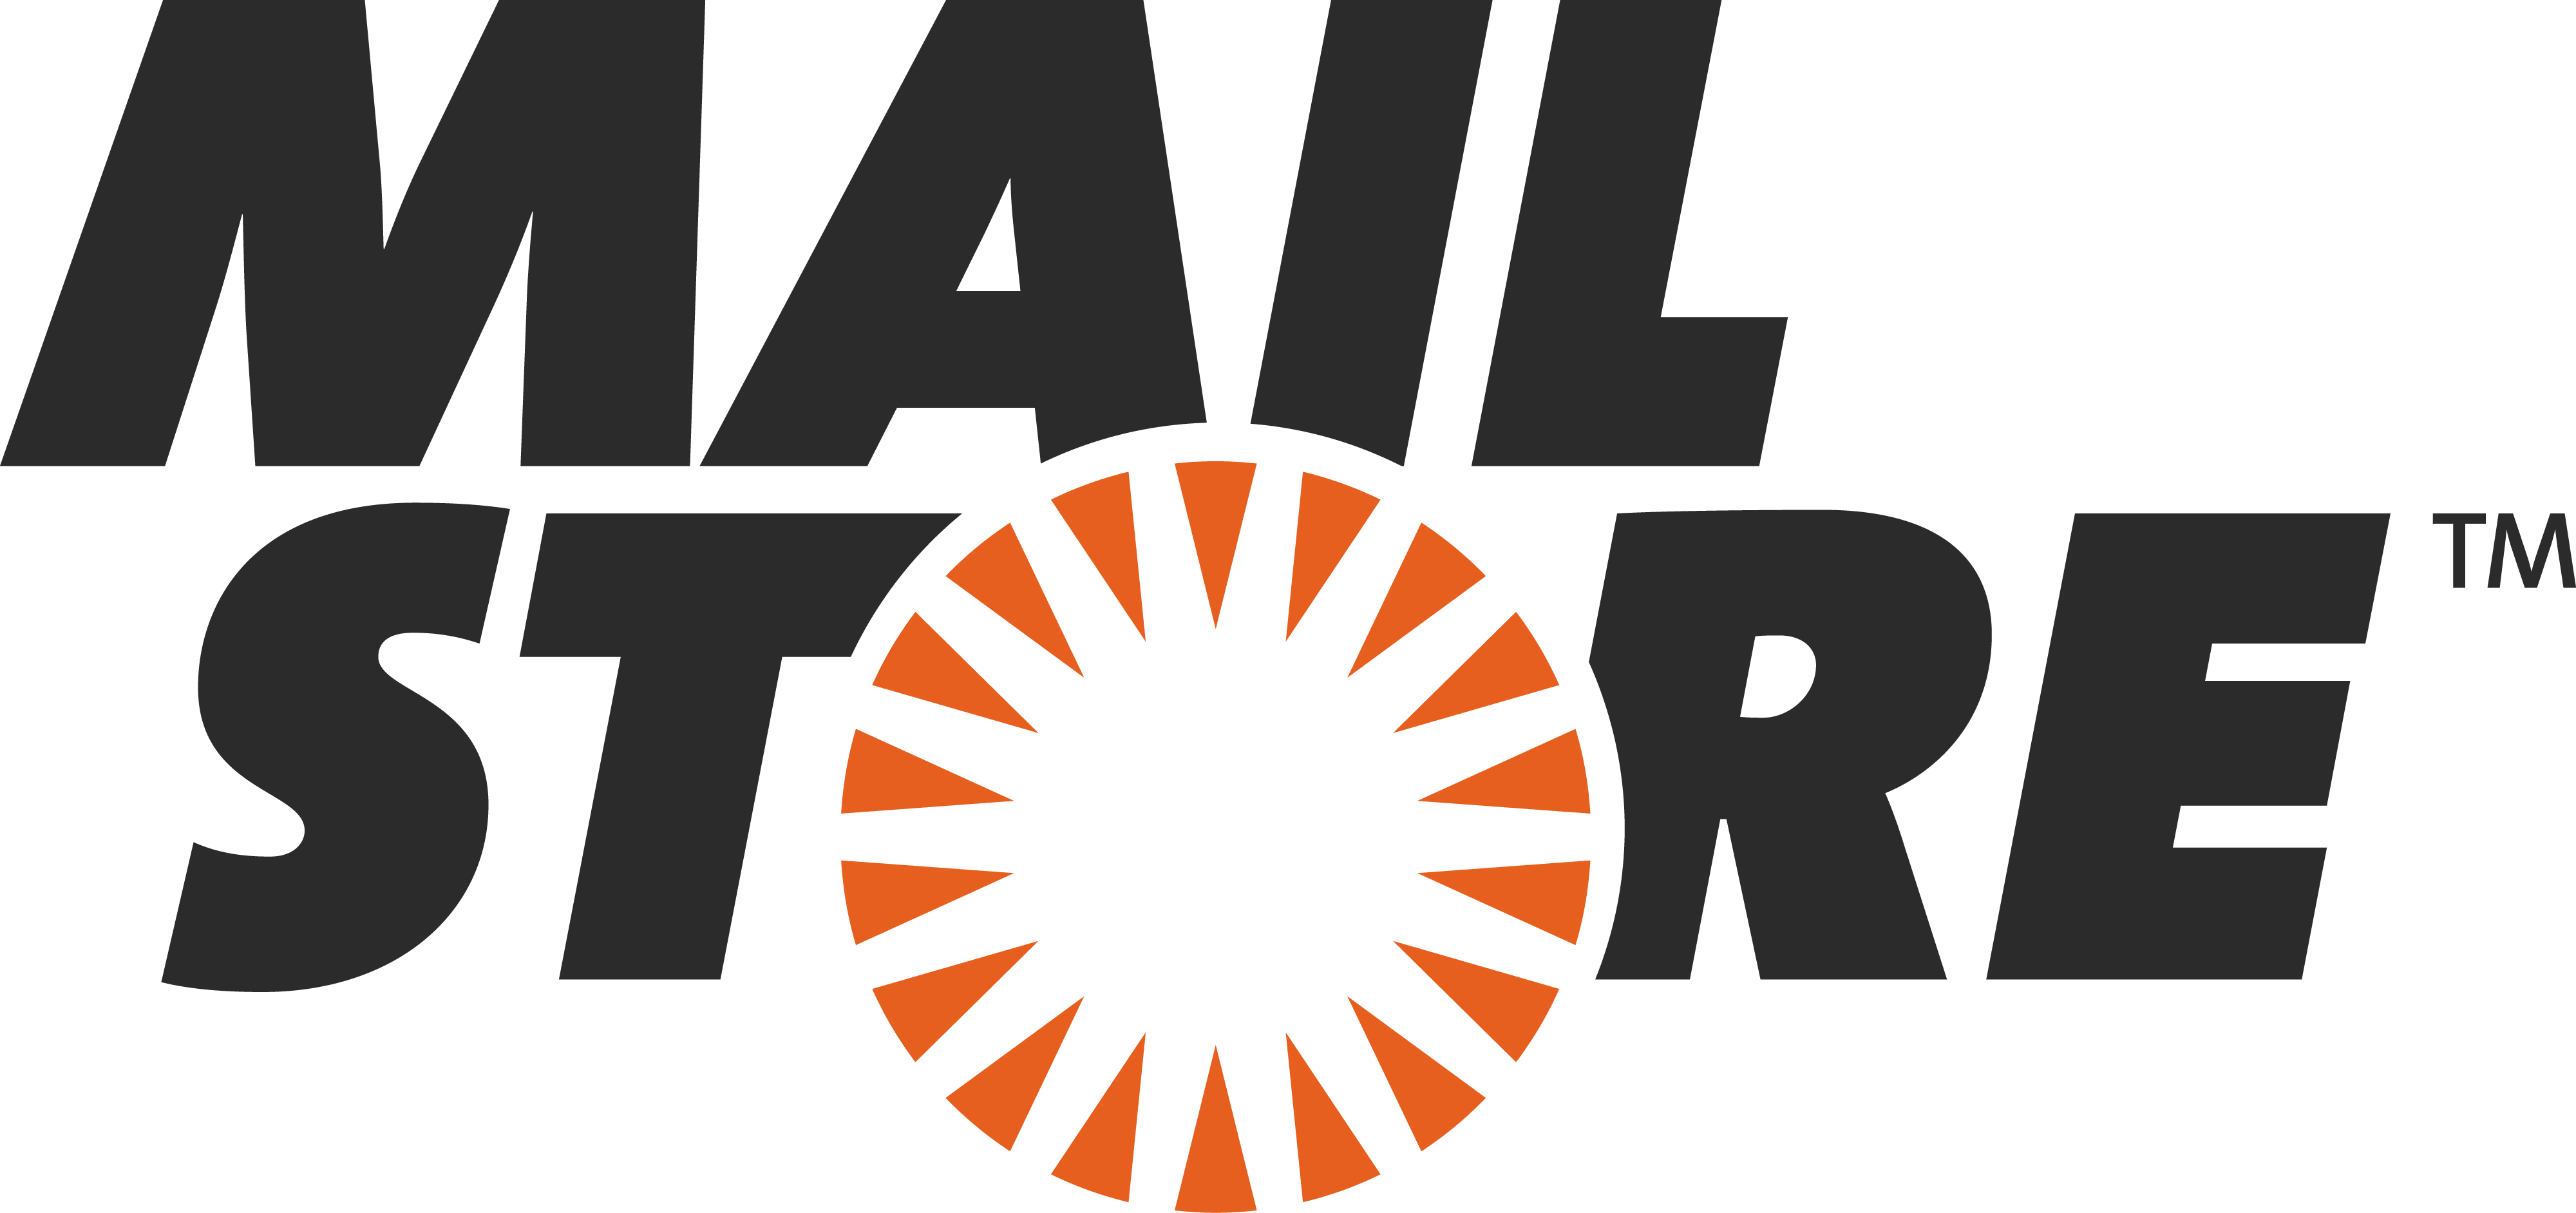 MailStore - Logo produktu